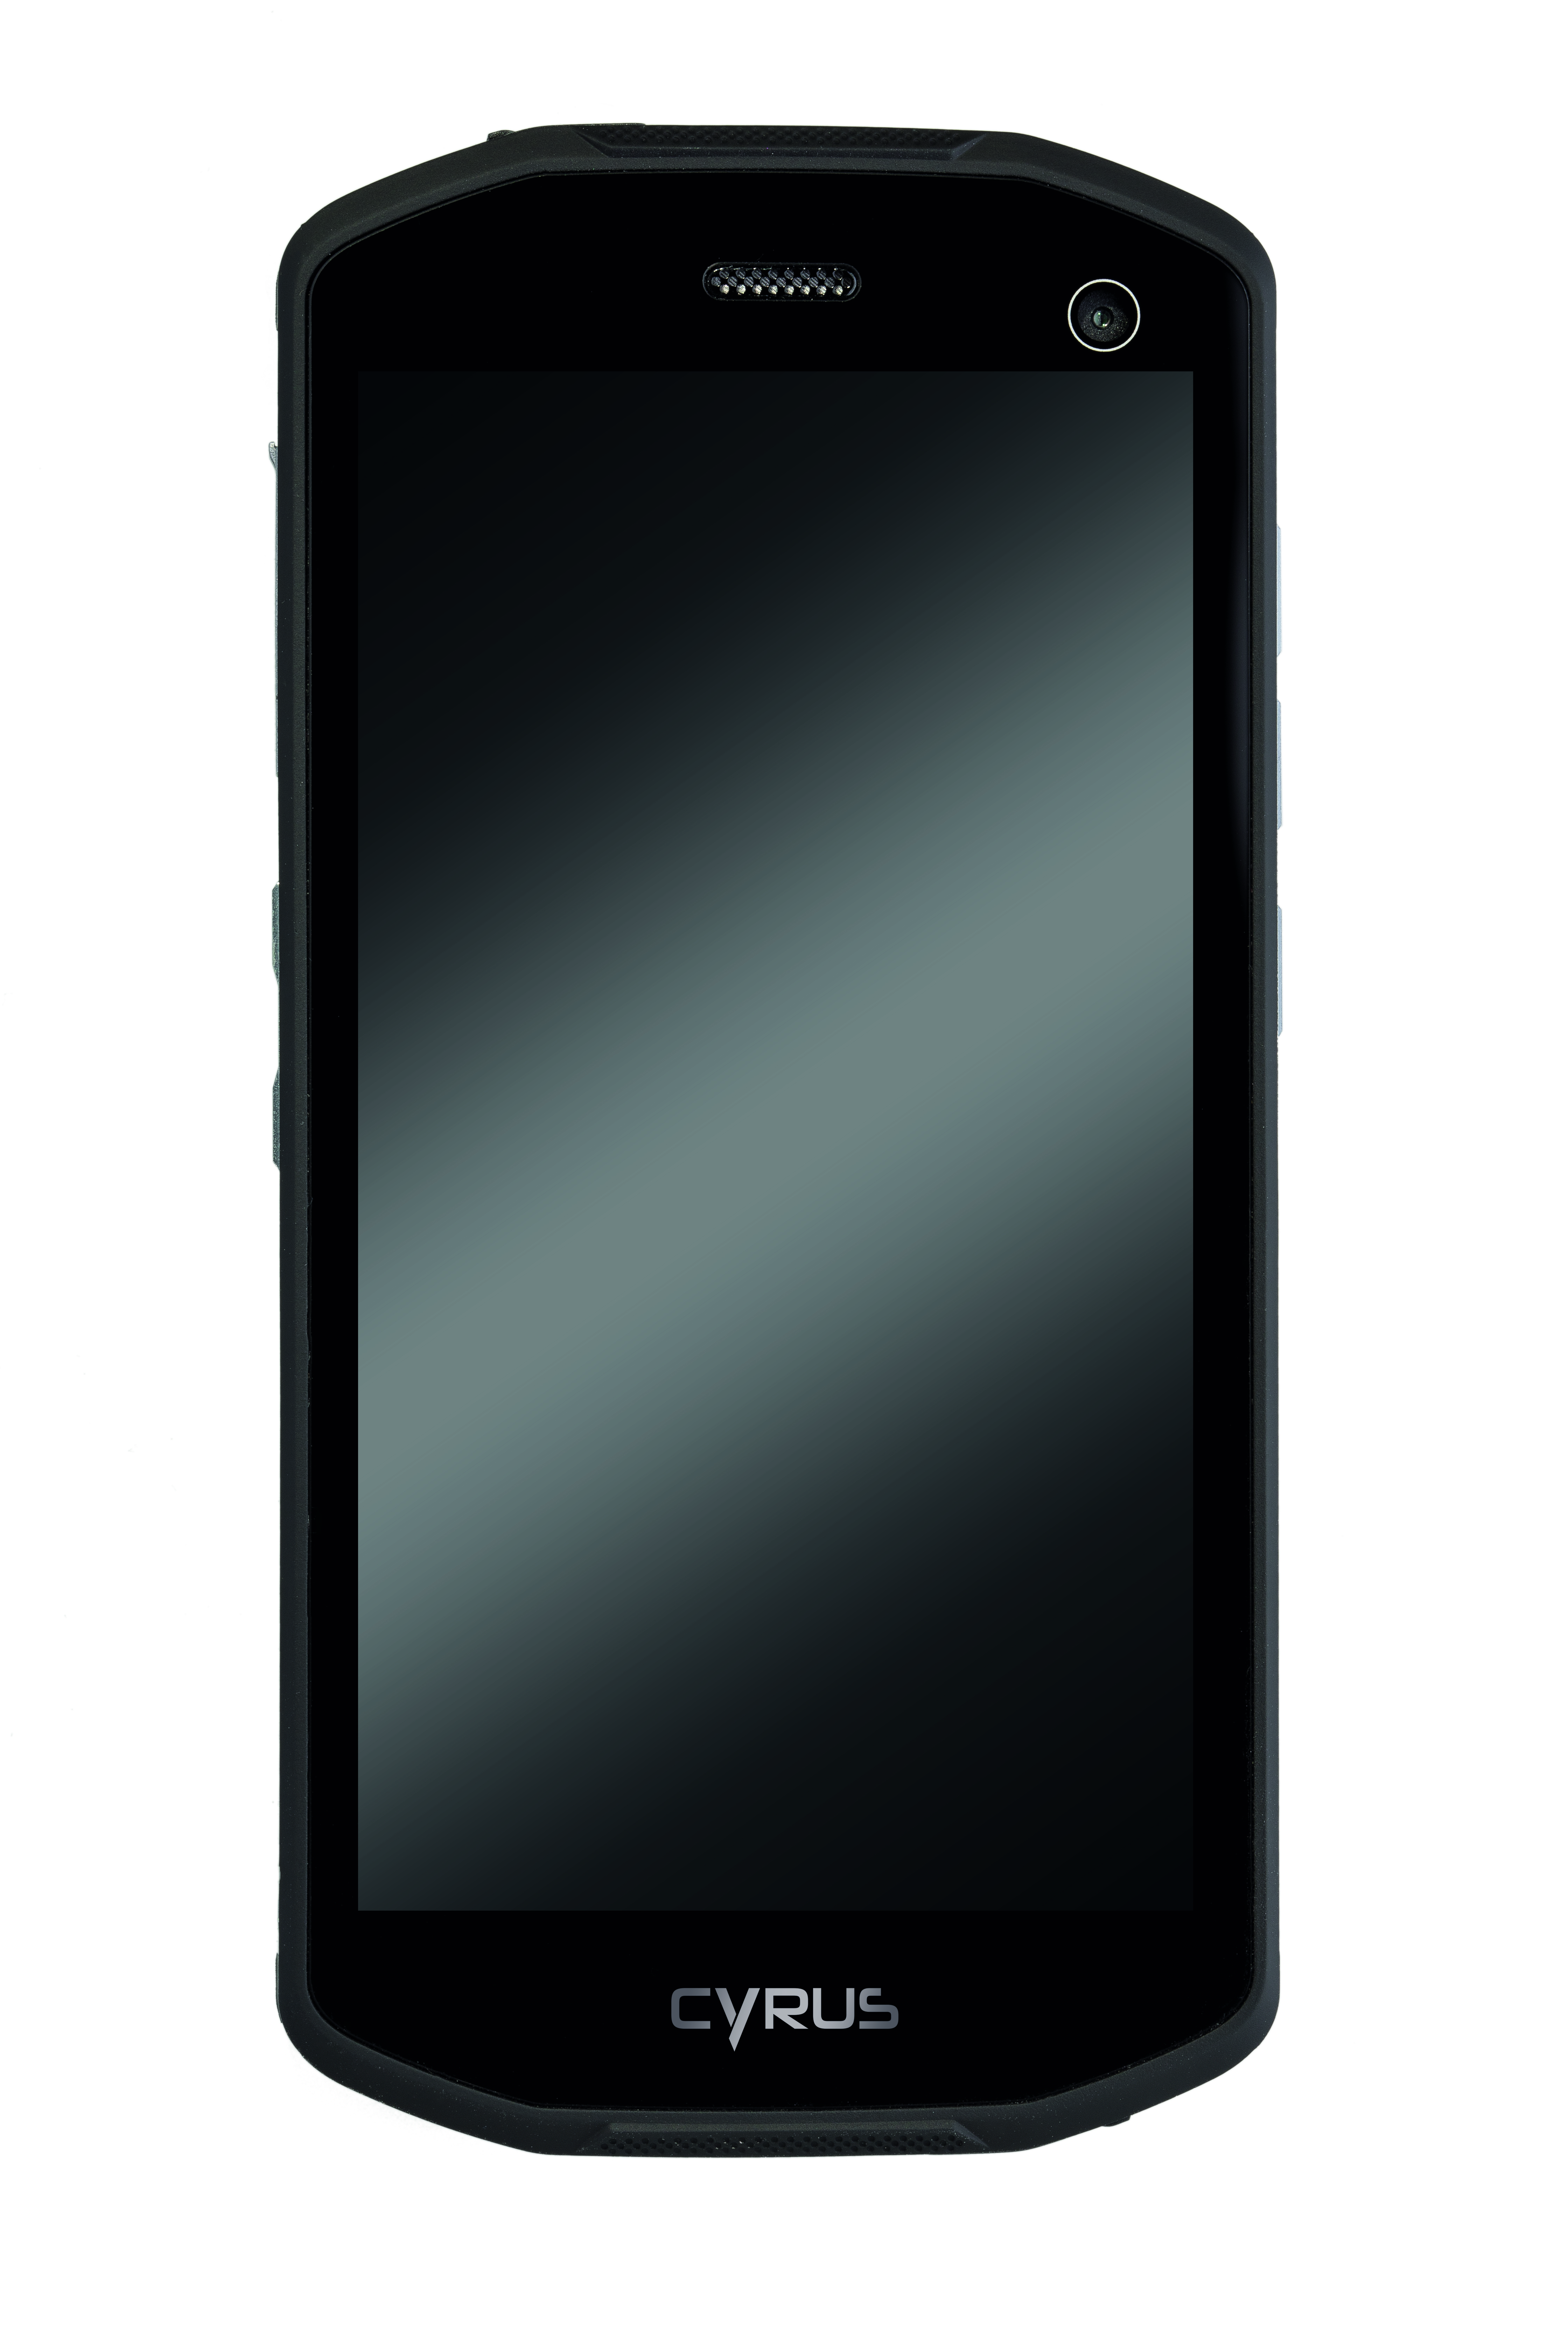 Outdoor Telefone - Cyrus Outdoor Smartphone CS28 Hipster 2.0 Stoßsicher, staubgeschützt, wasserfest, 12,70cm (5') Display (1280x720), IP 68, 3GB RAM, 32GB Rom, 4000mAh, 13,0 Megapixel Kamera (CYR10109 Rev.2)  - Onlineshop JACOB Elektronik